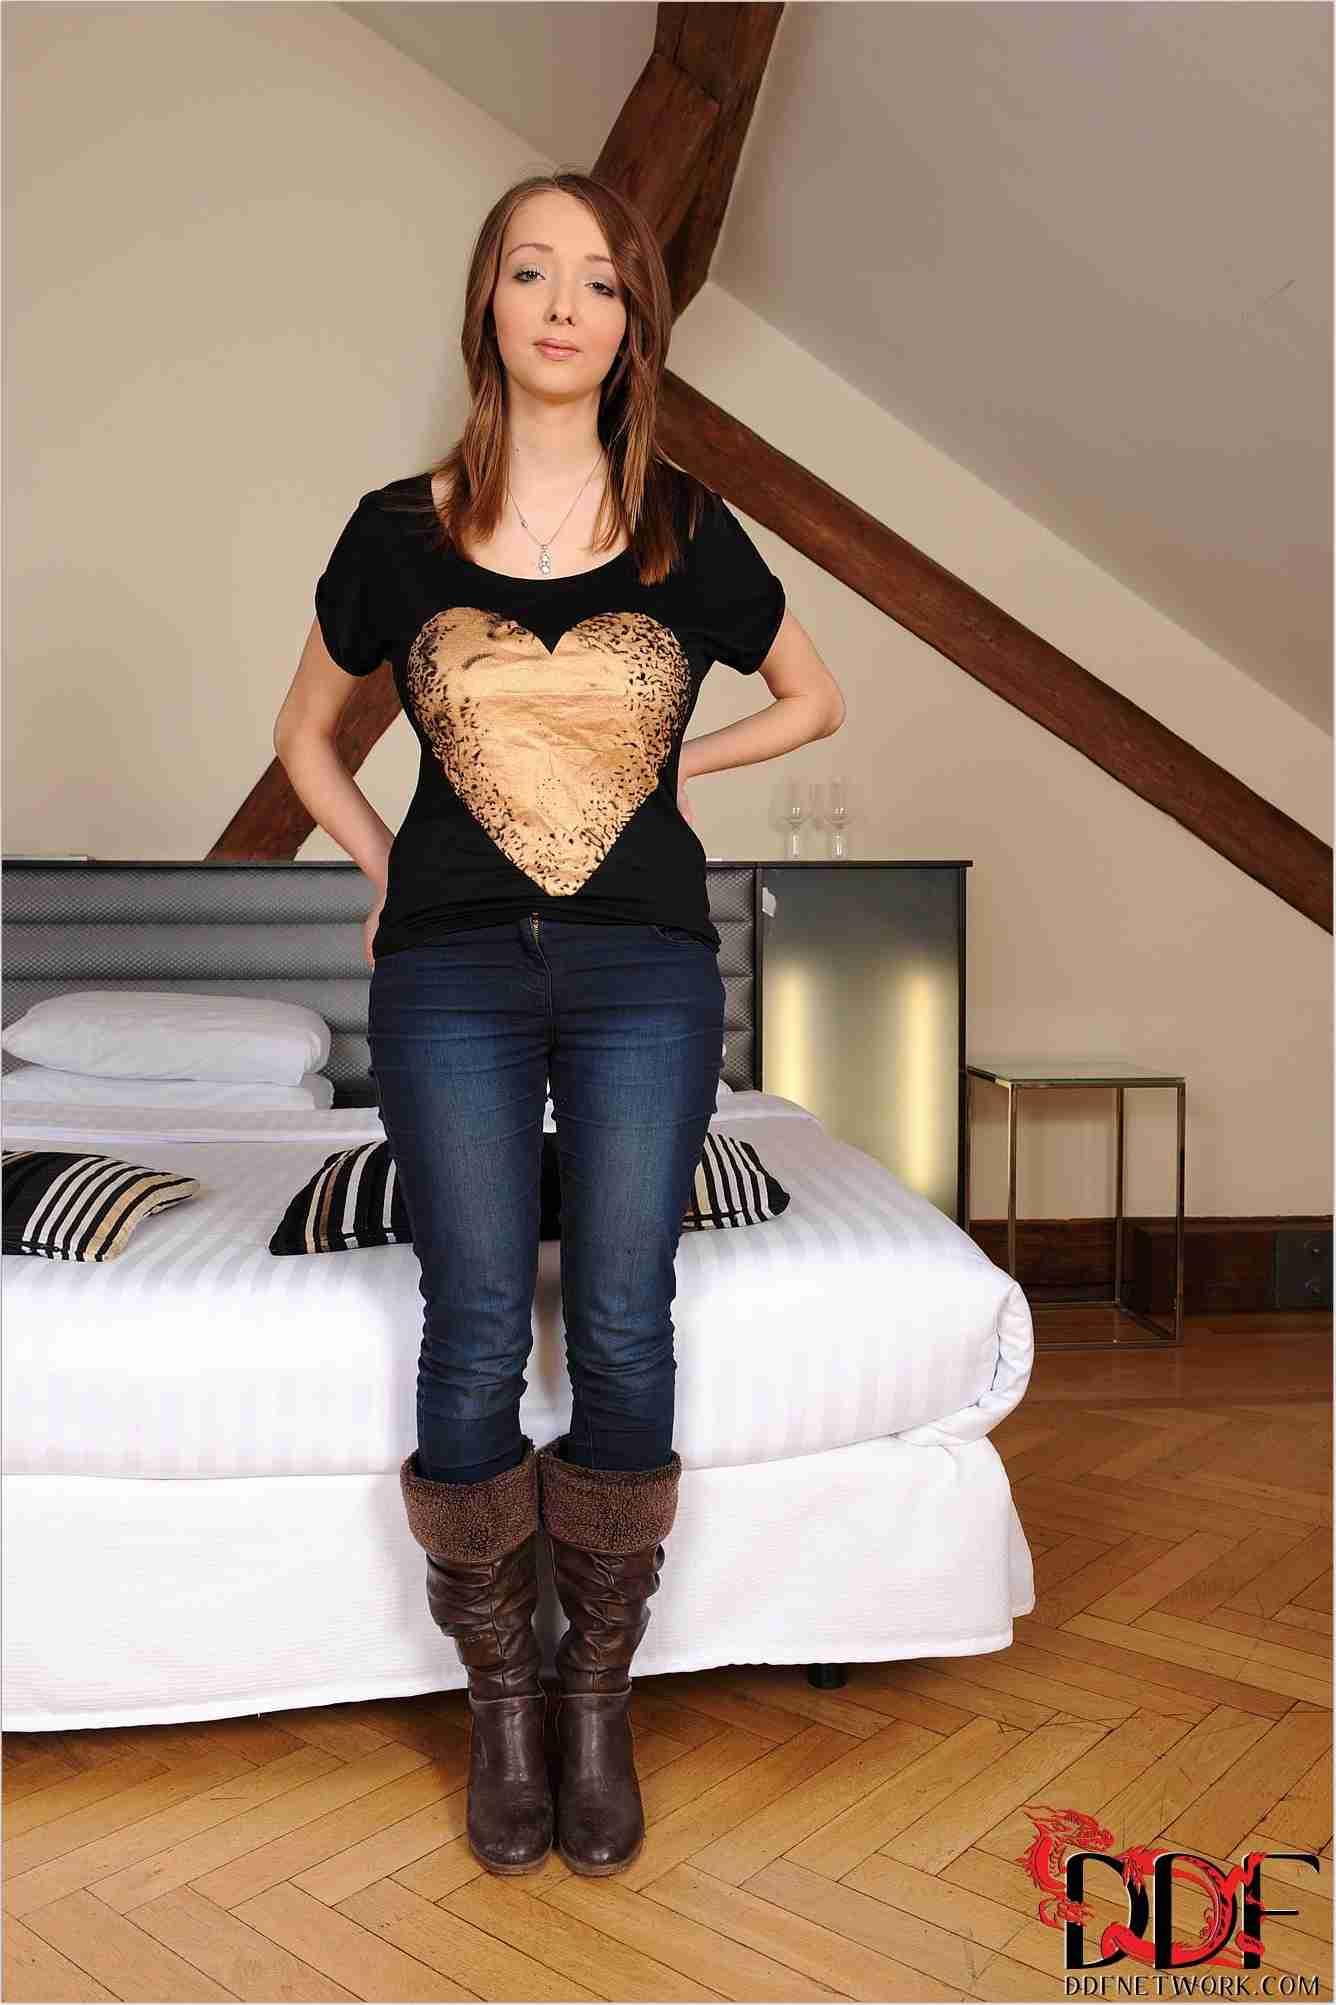 Lucie Wilde Net Worth, Bio, Height, Family, Age, Weight, Wiki